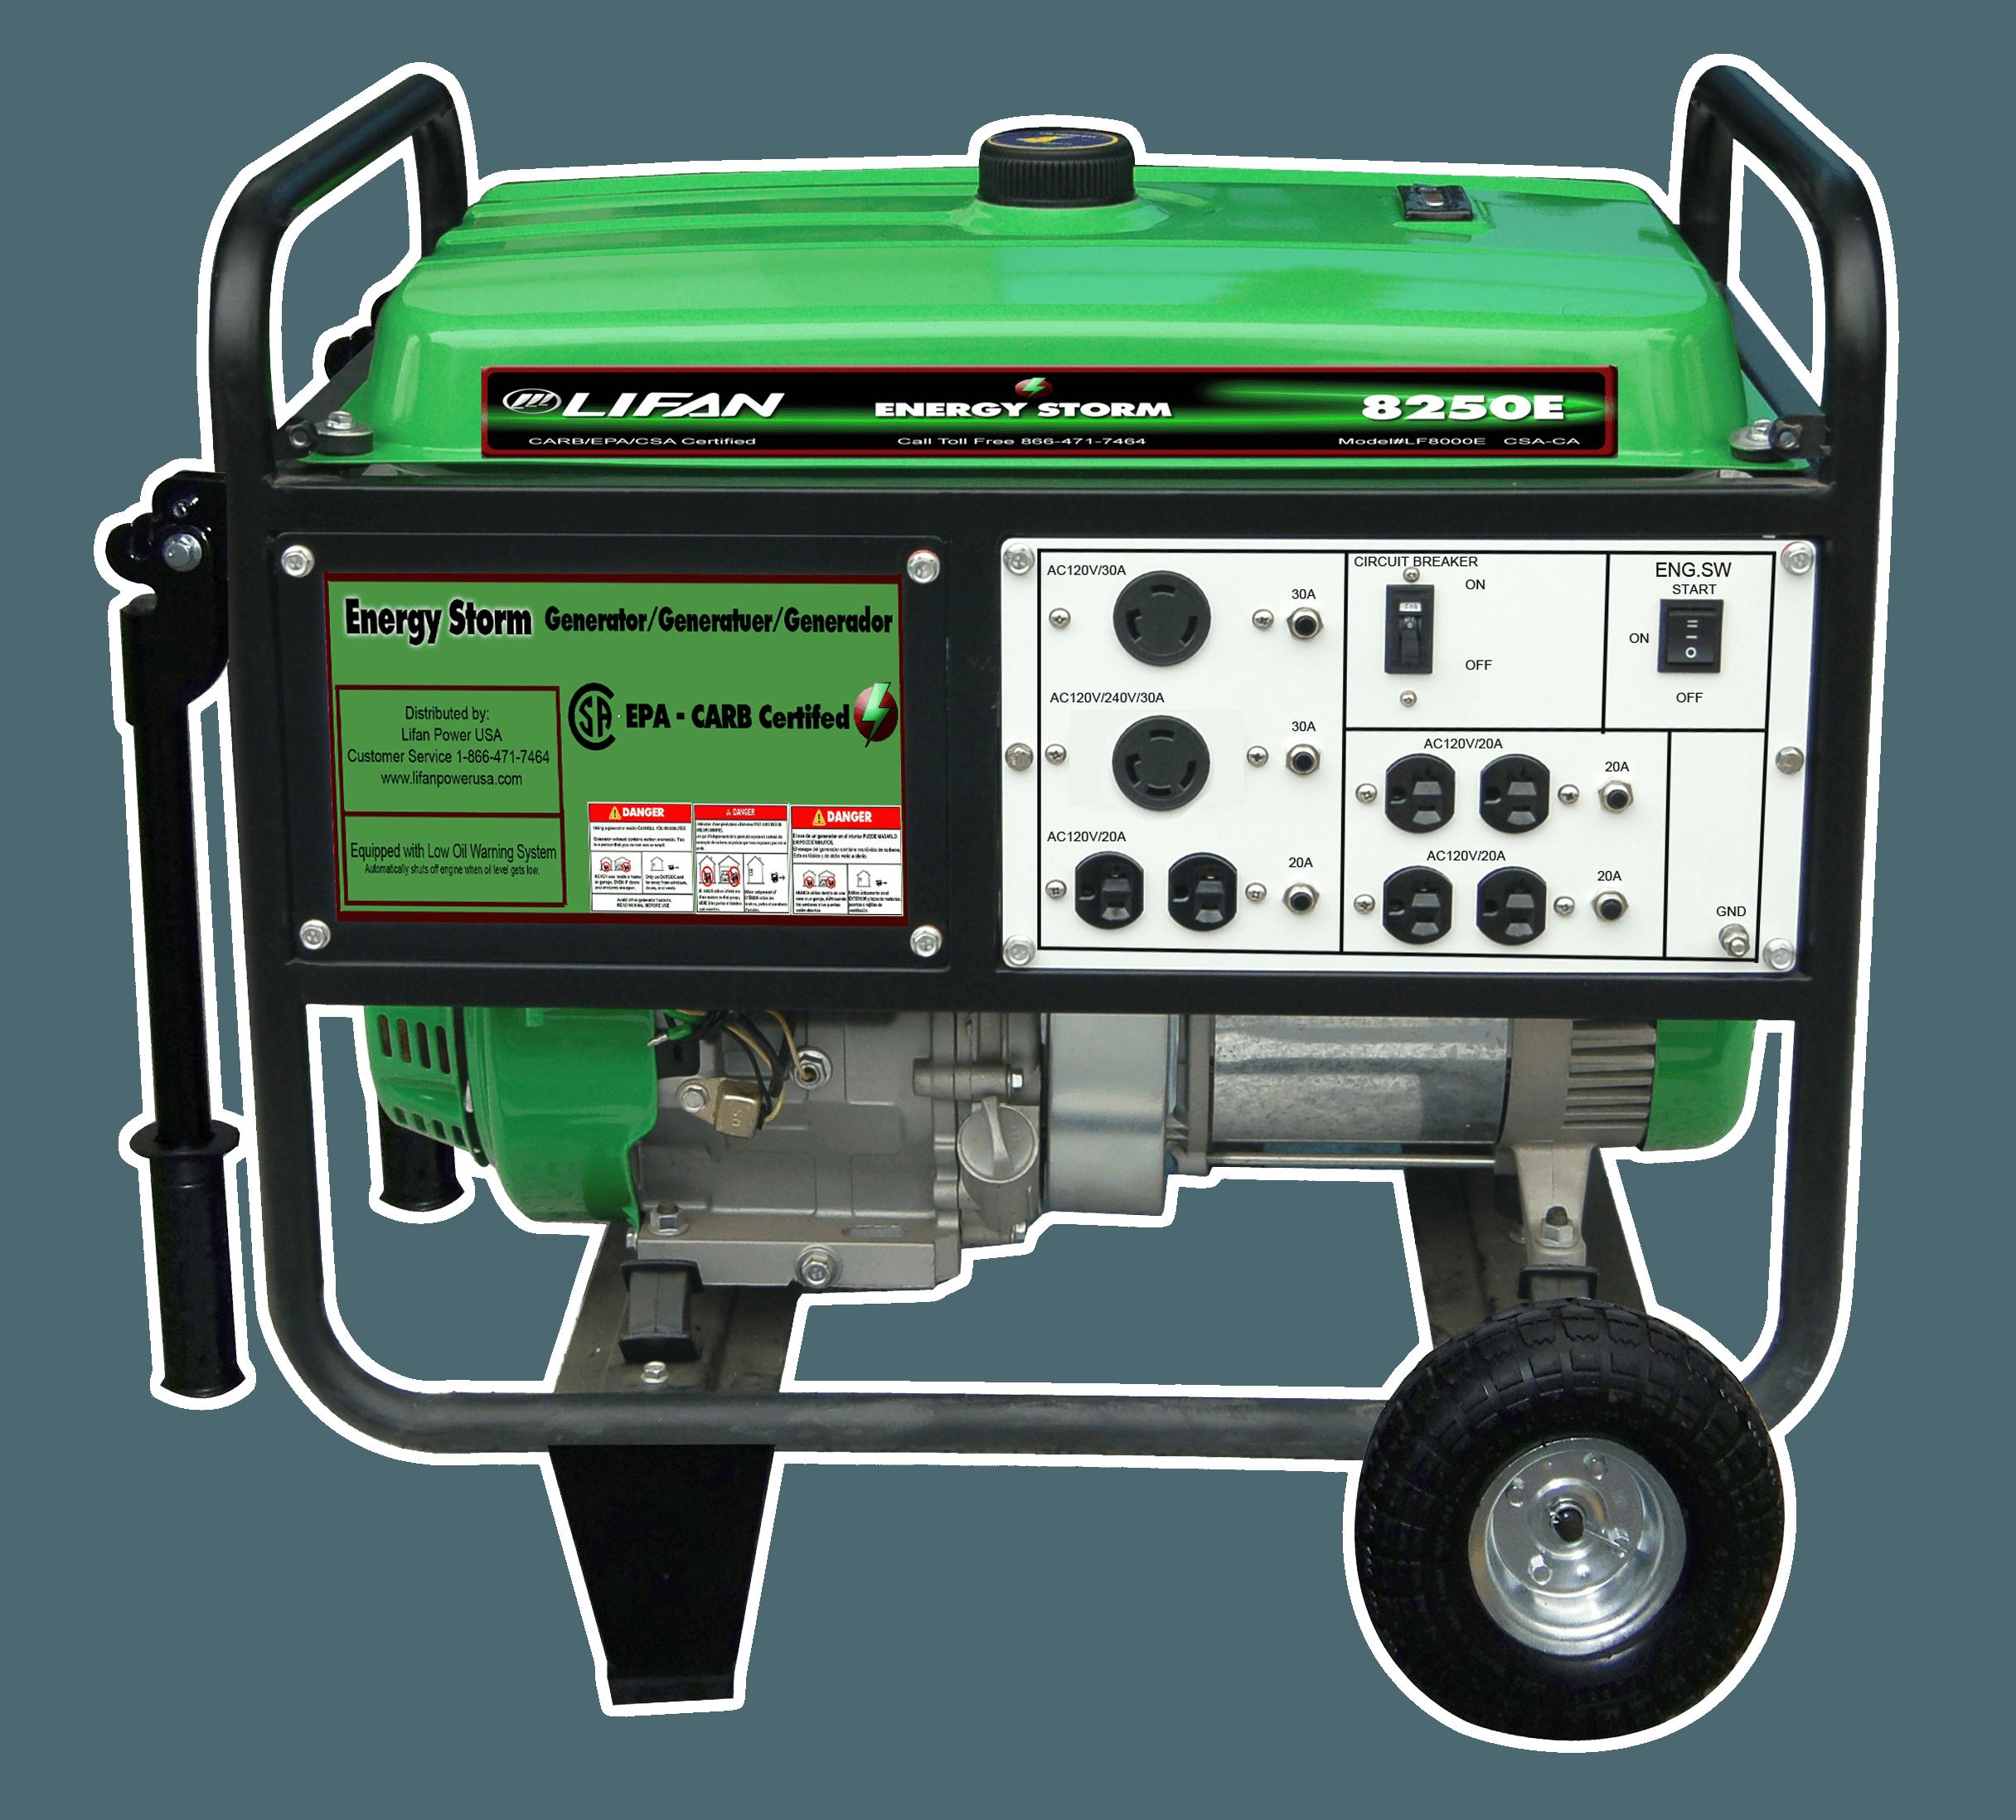 Lifan 5500 Storm Wiring Diagram Reinvent Your Ct70 Energy 8250 E Power Usa Rh Lifanpowerusa Com 1970 Color